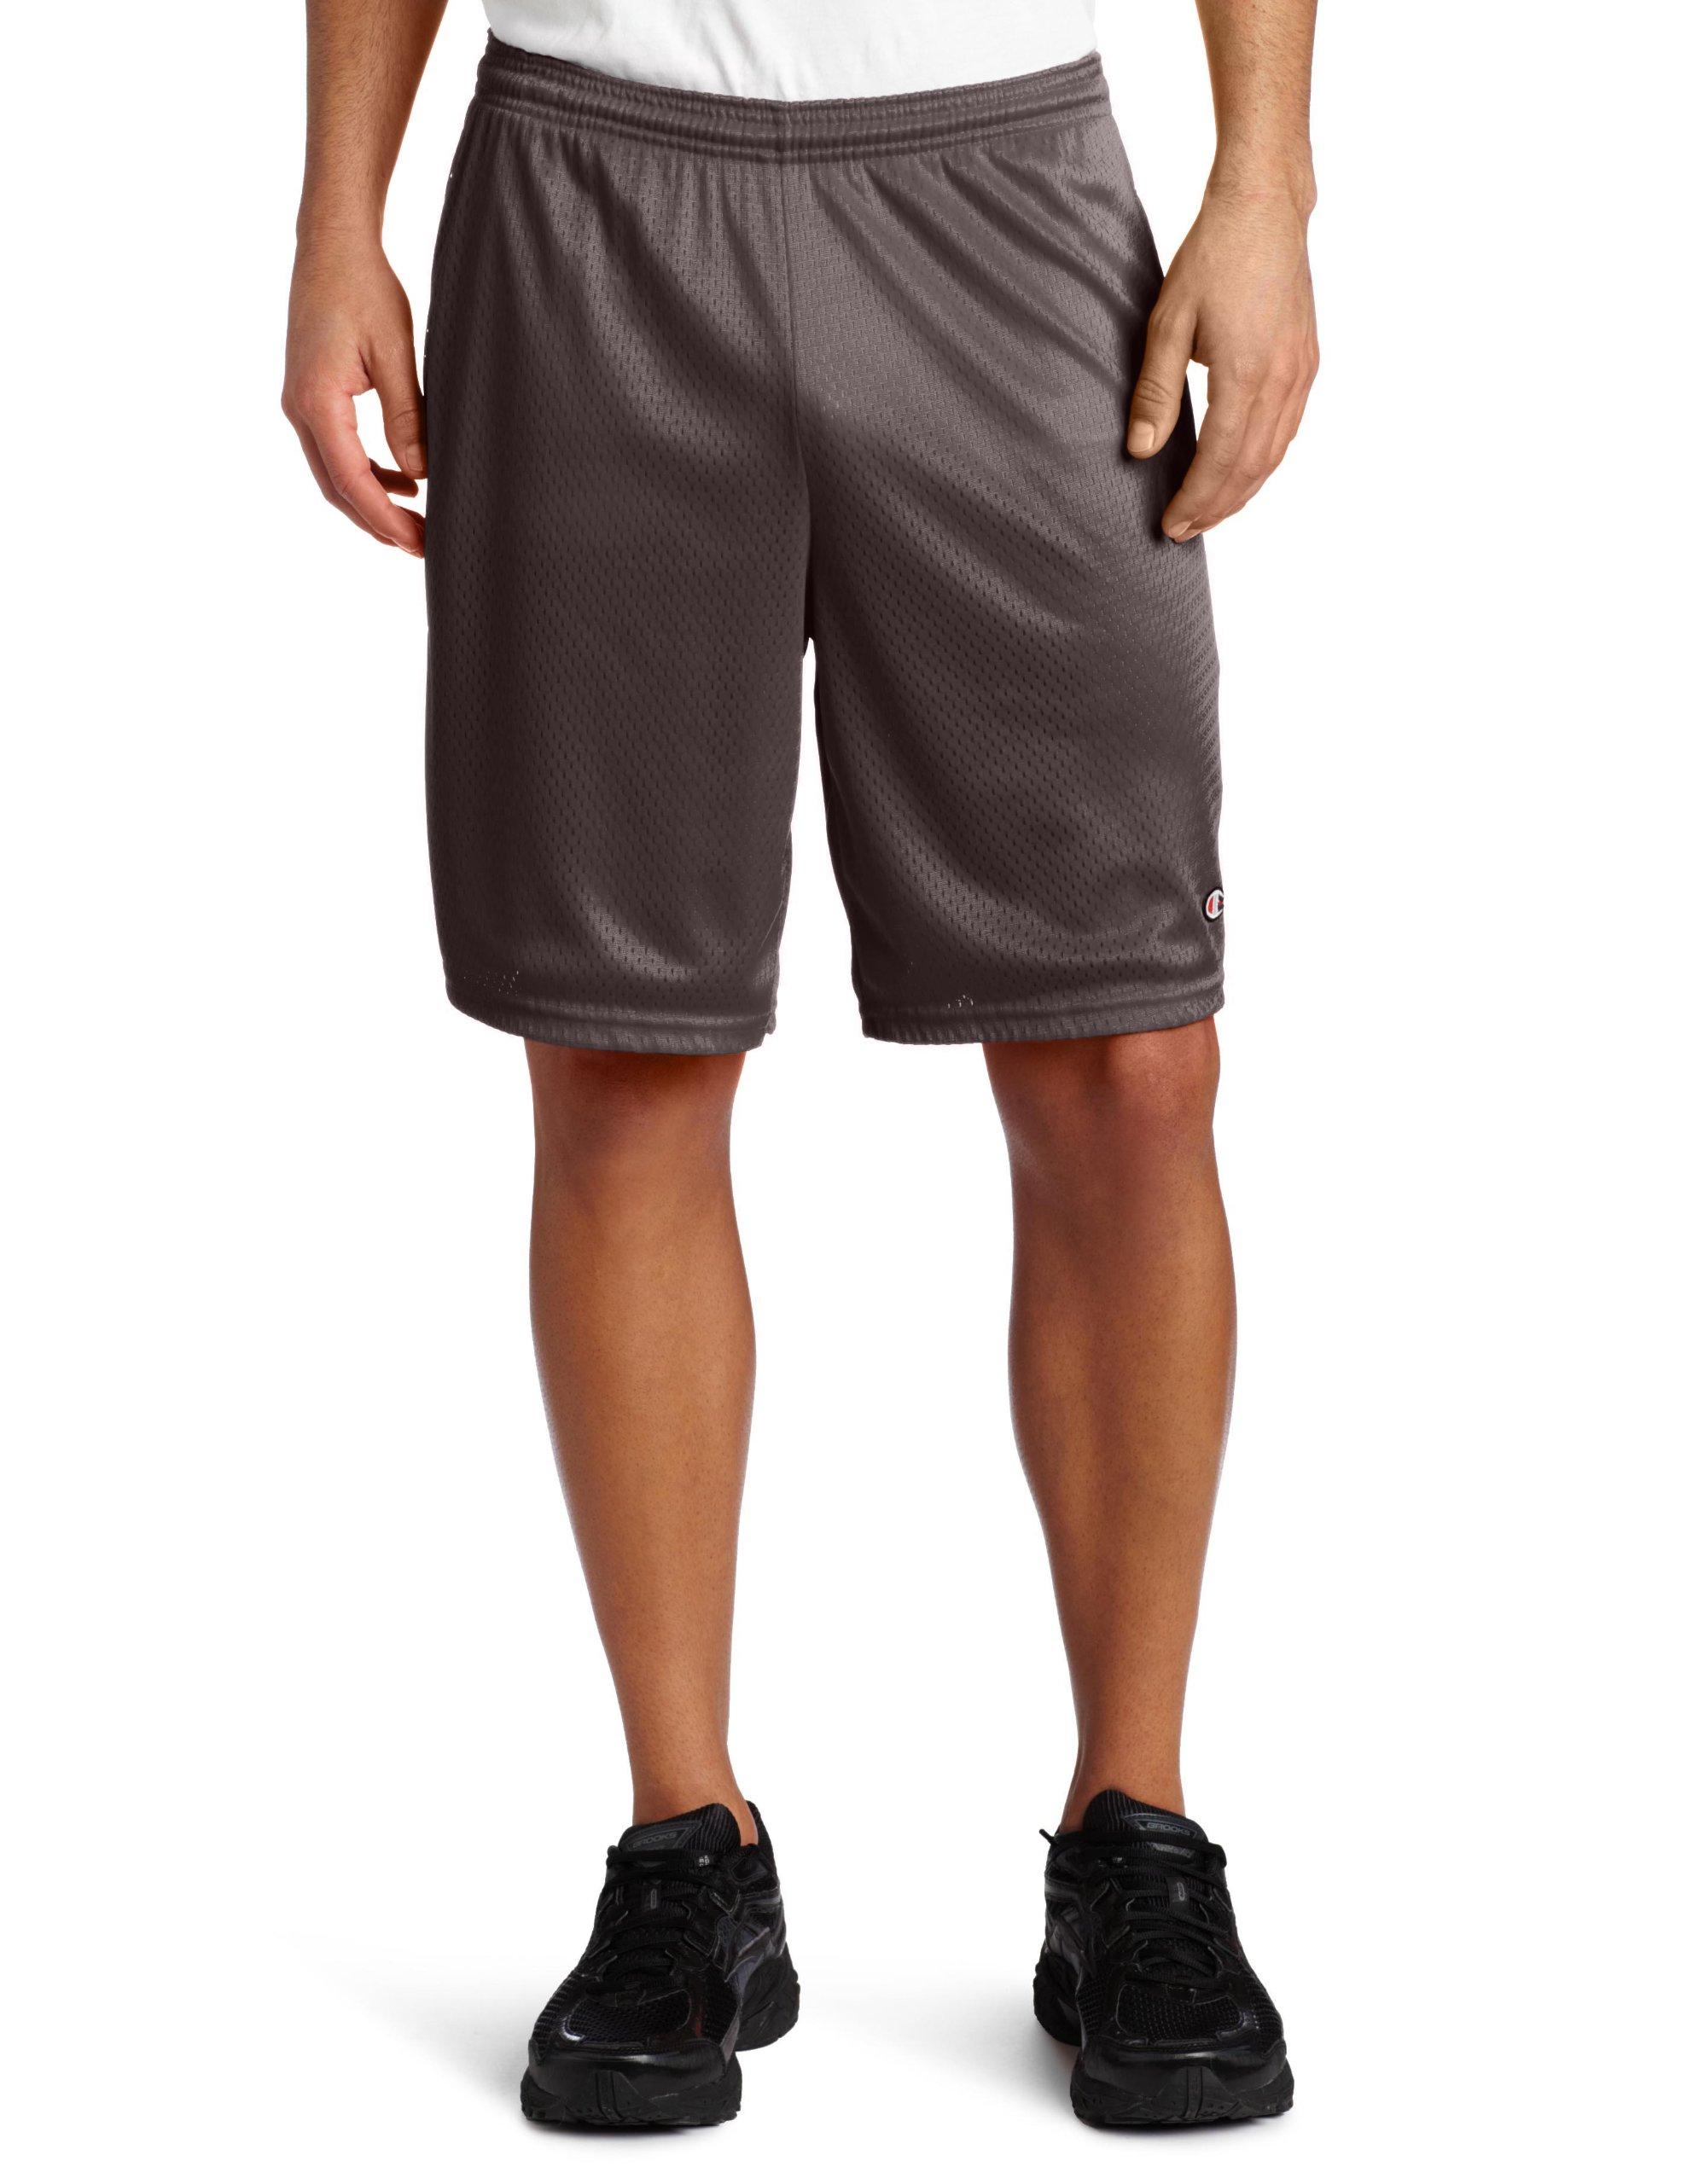 Champion Men's Long Mesh Short With Pockets,Granite Heather,Small